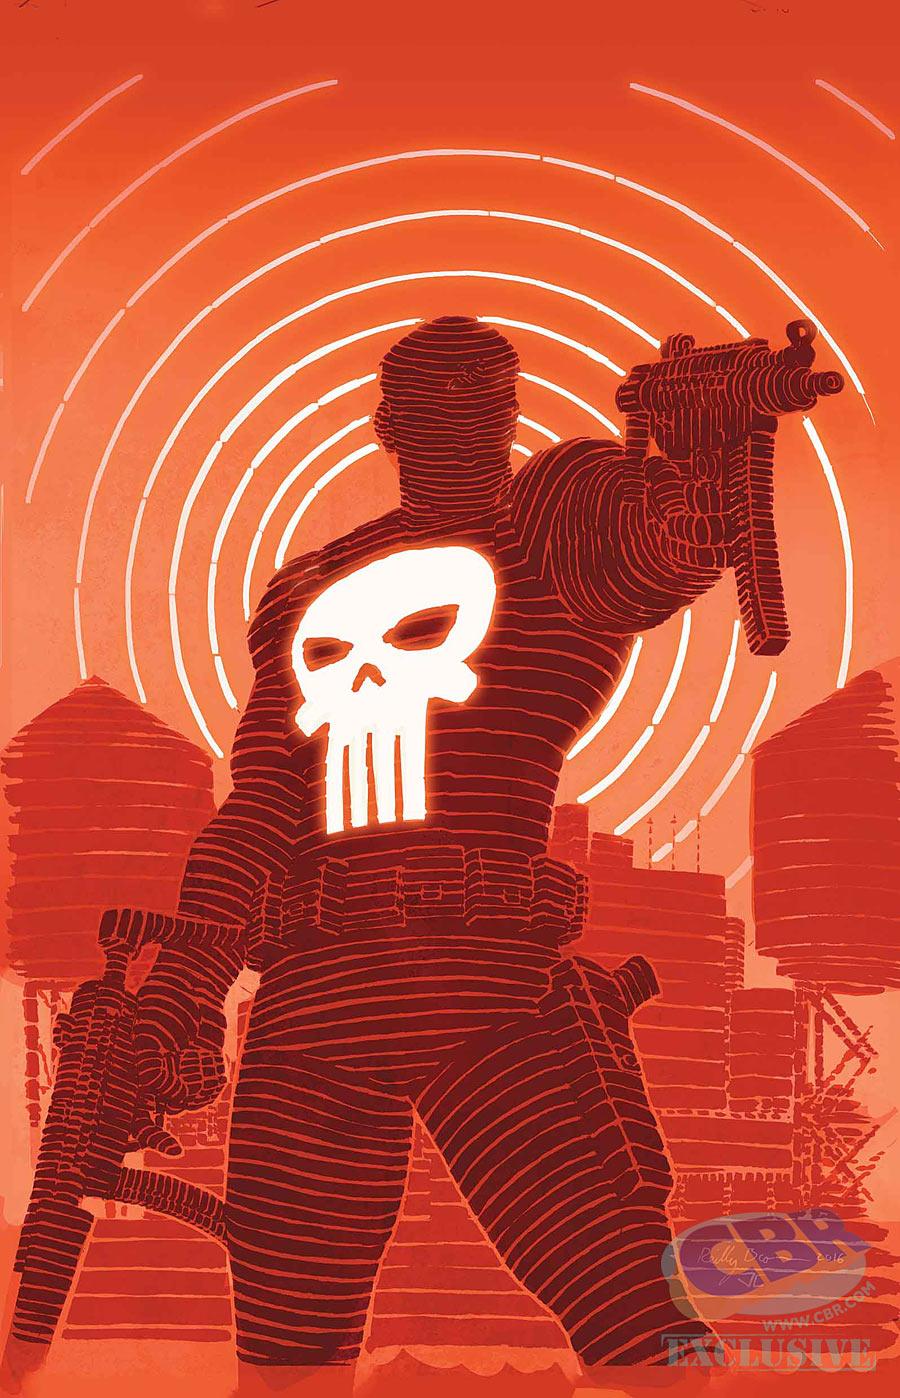 Daredevil Punisher Seventh Circle #3, copertina di Reilly Brown